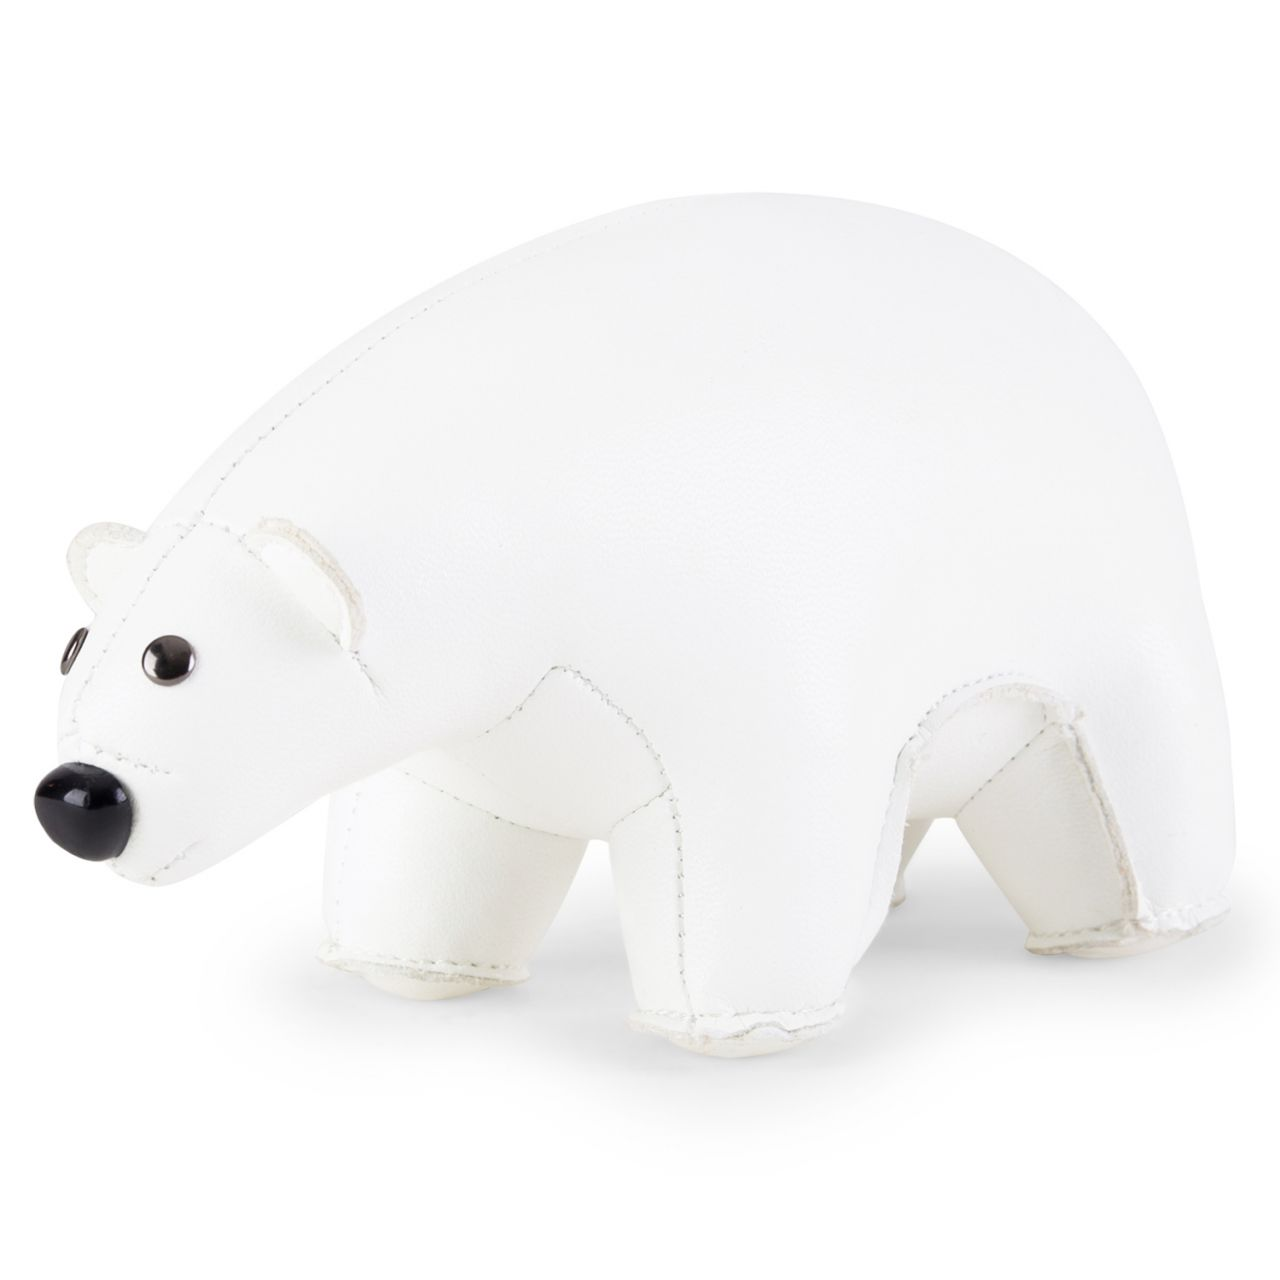 Züny - Briefbeschwerer Polarbär ZCPV0989